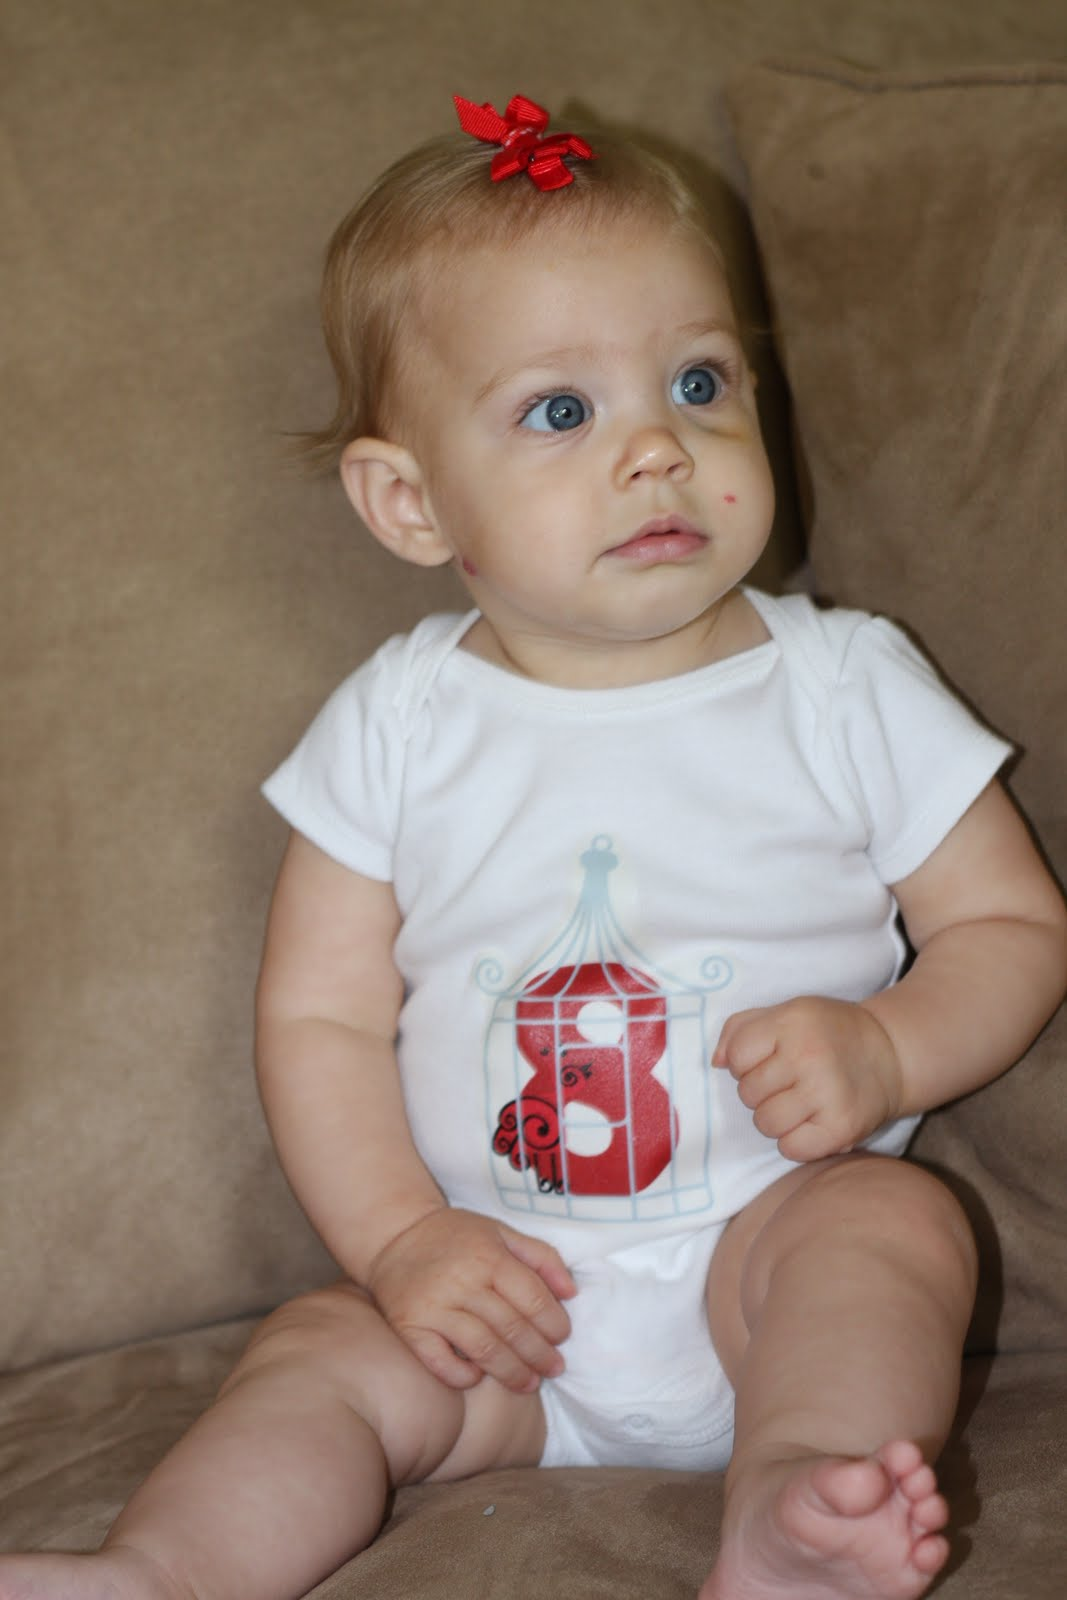 copil la 8 luni